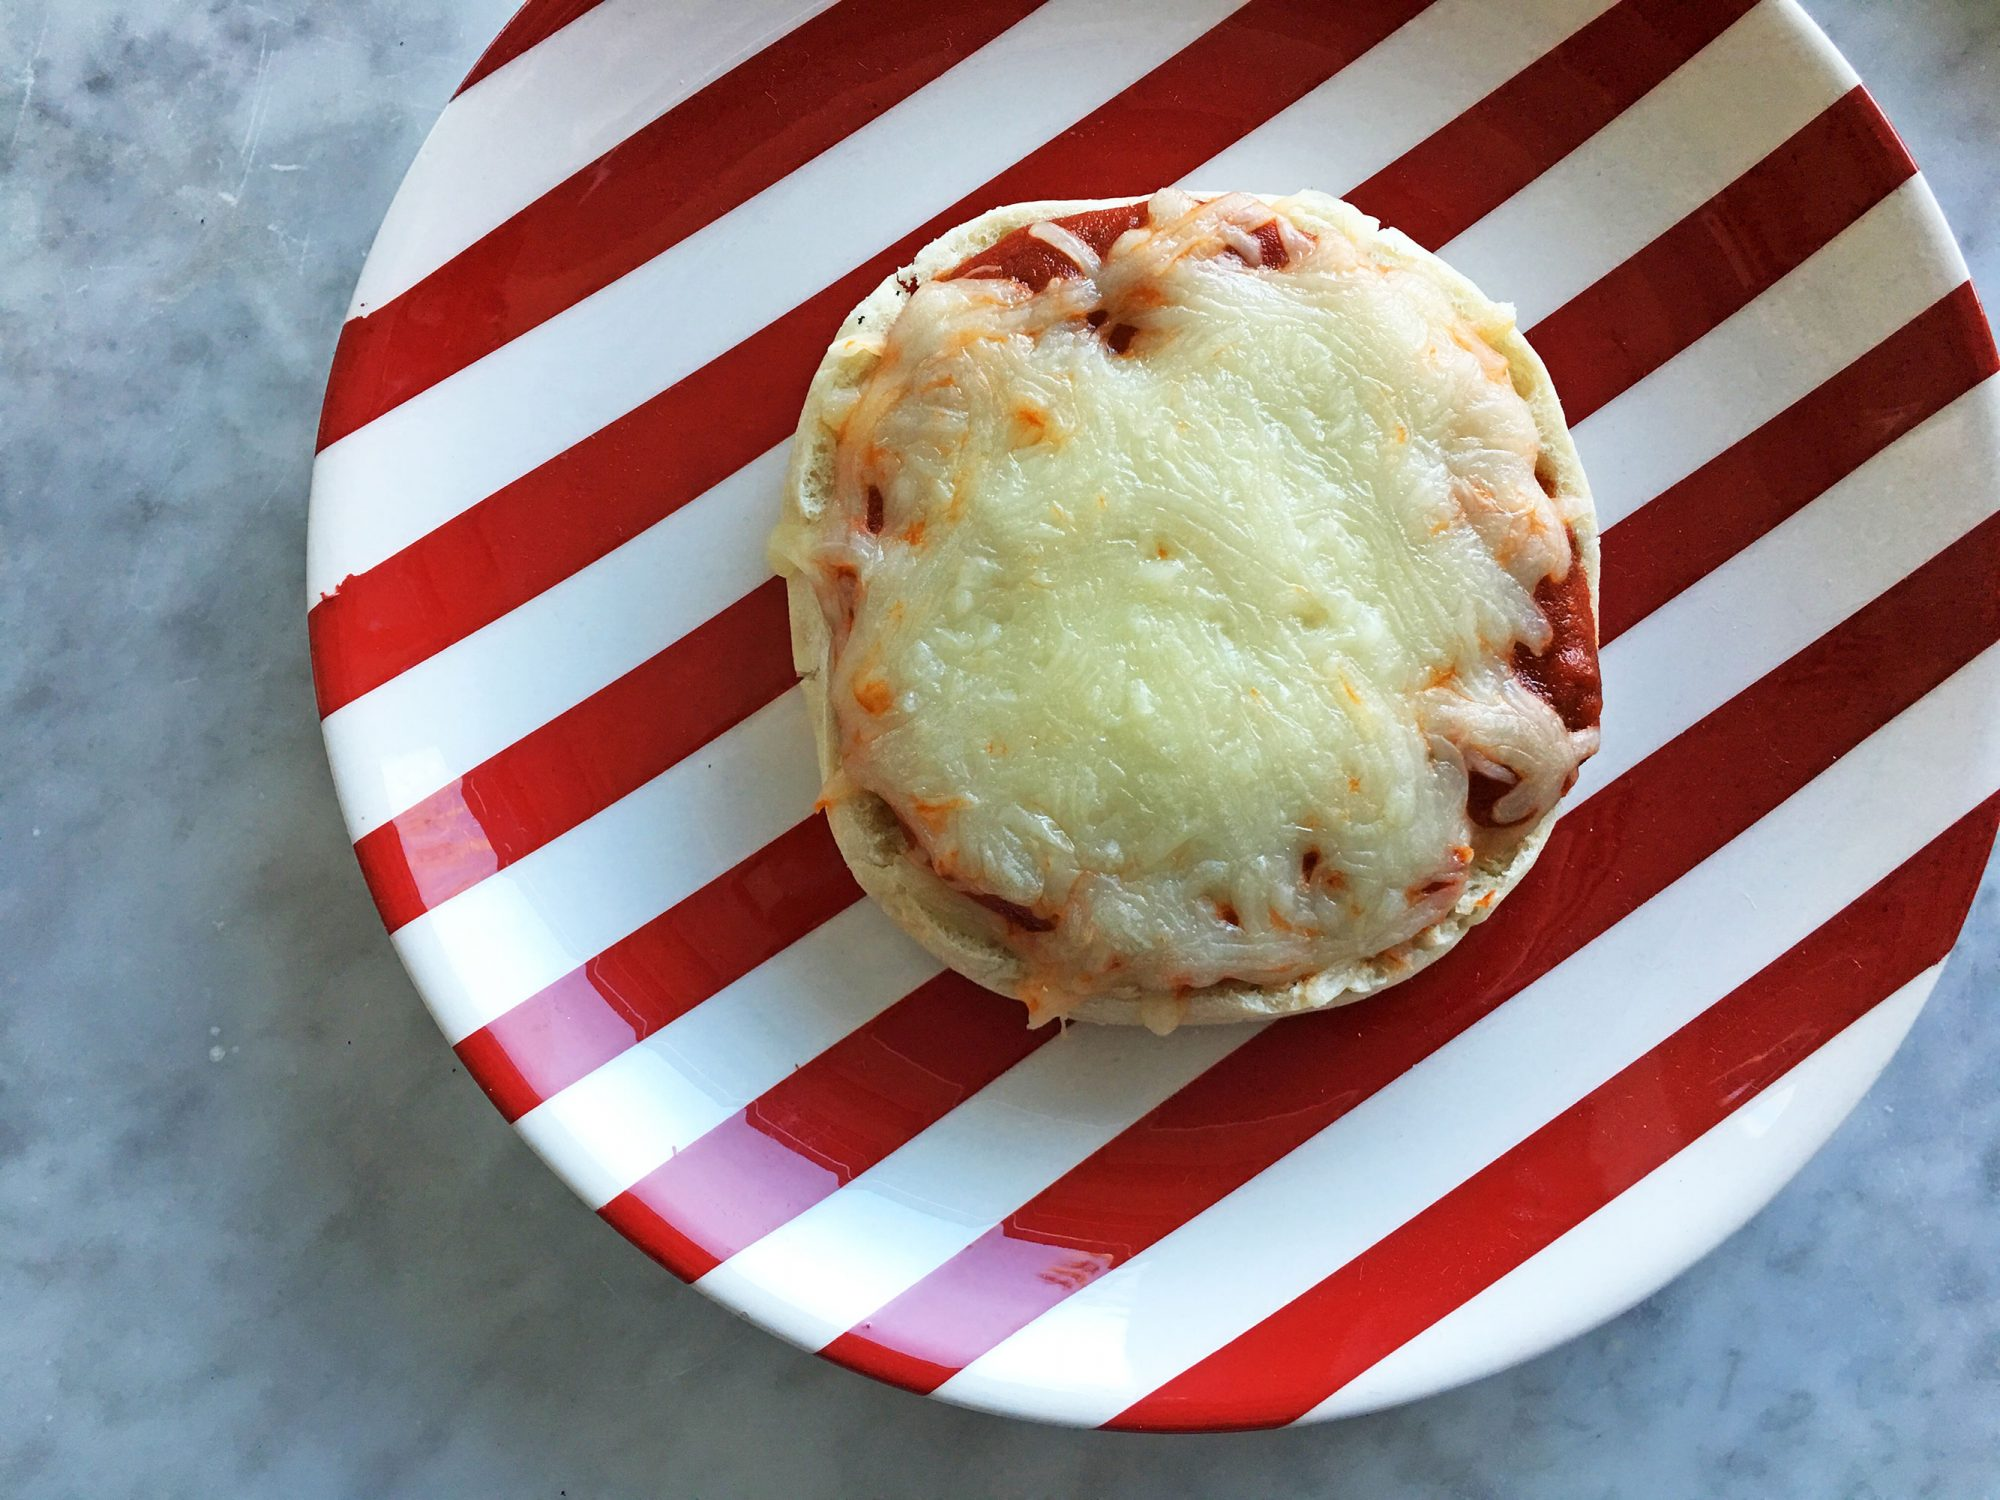 toaster-oven-mini-pizza-image